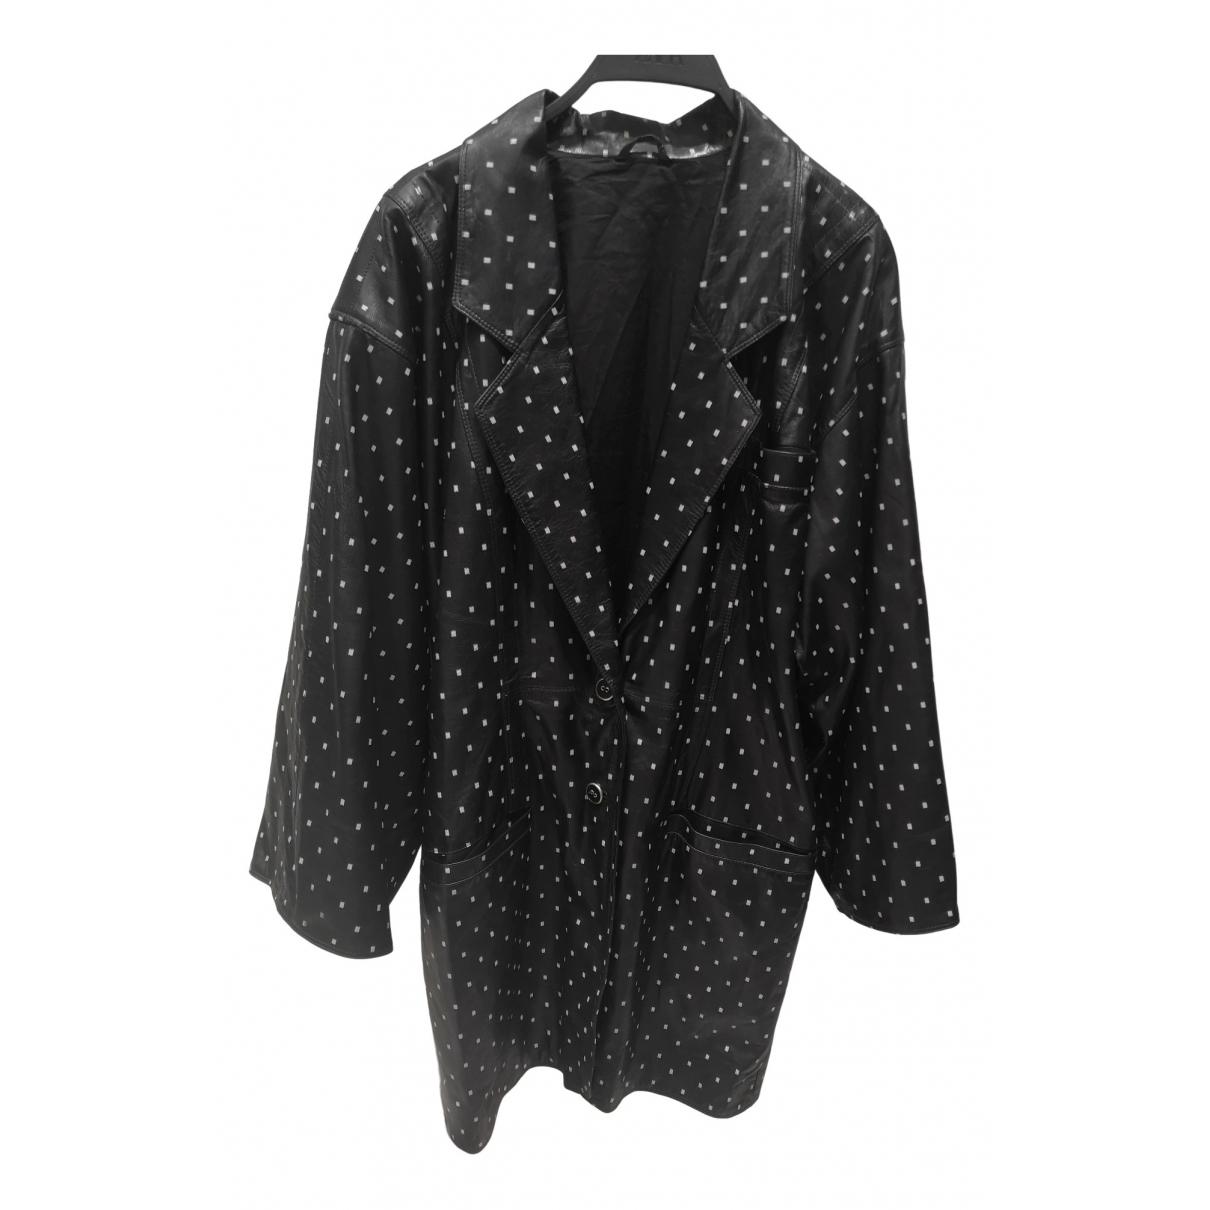 Gianni Versace \N Jacke in  Schwarz Leder